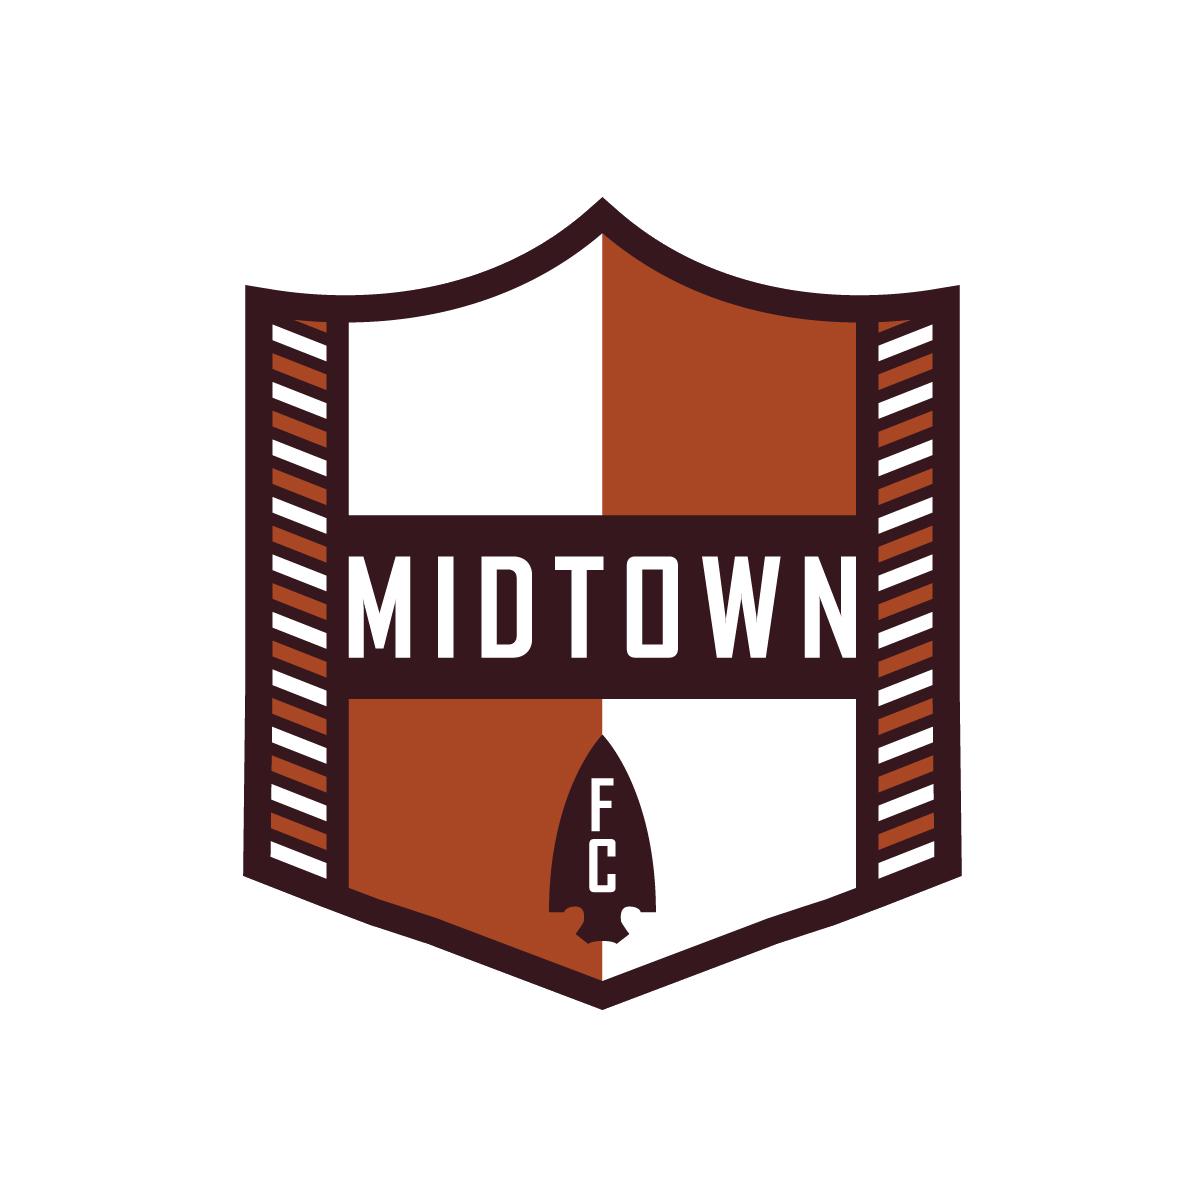 Midtown_nobkg.png